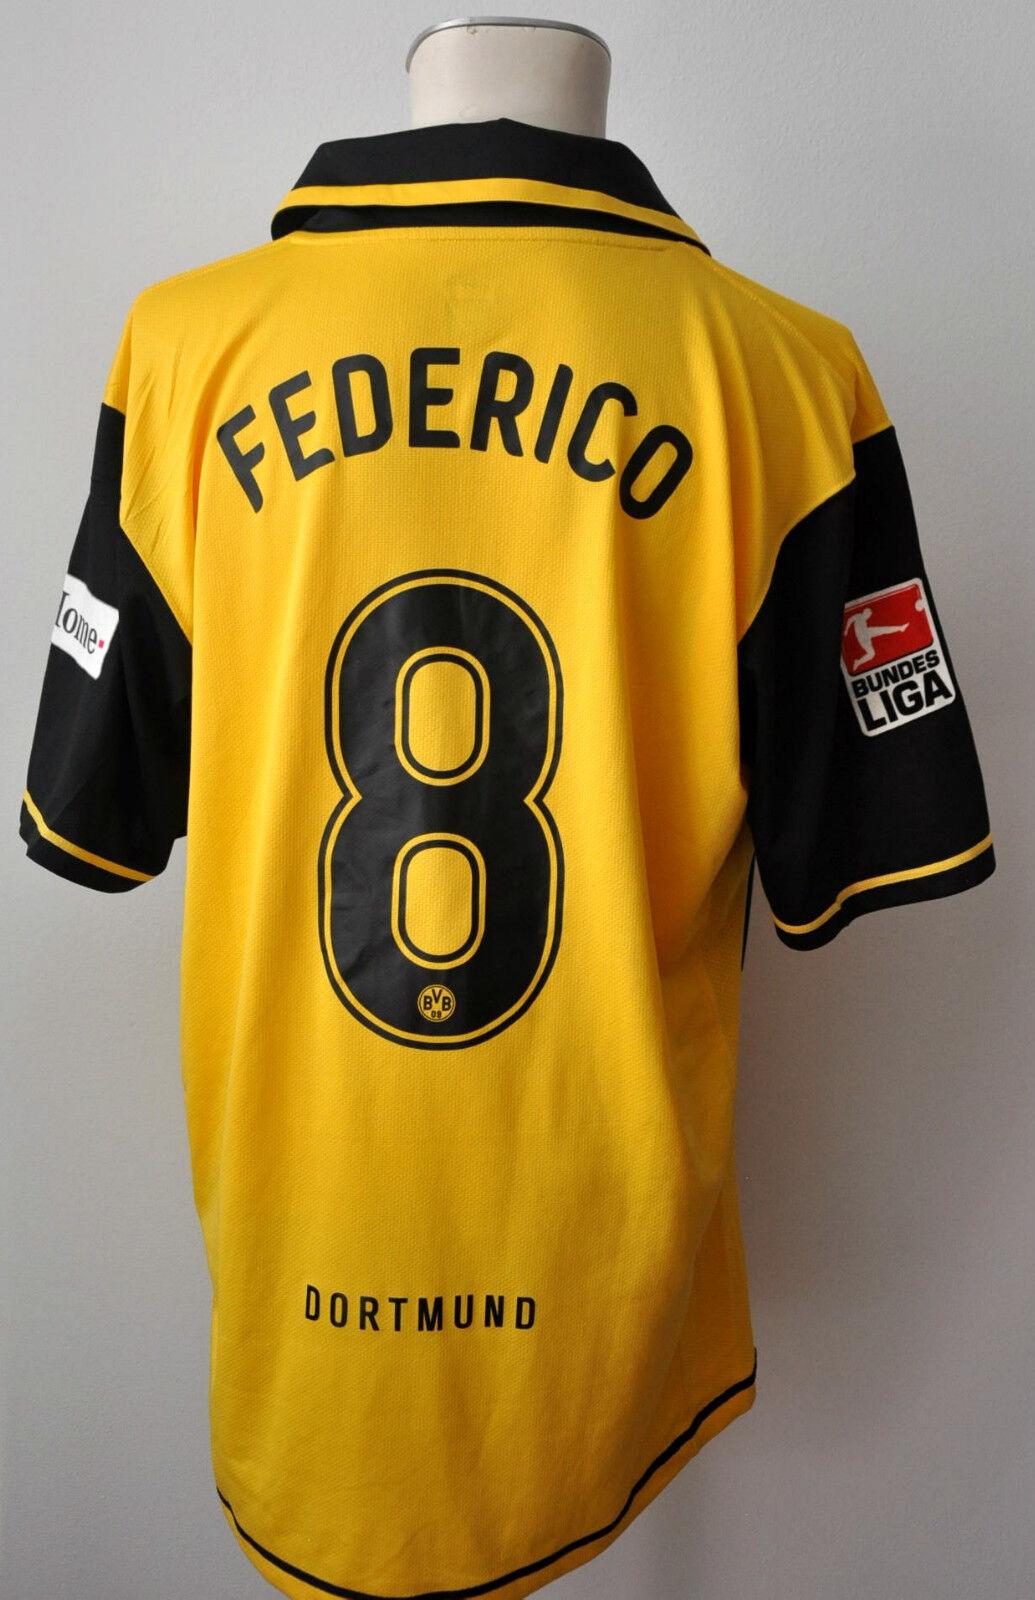 2007-08 Borussia Dortmund BVB Trikot    8 Federico Gr. XL Nike Patch Kult CL 11364e